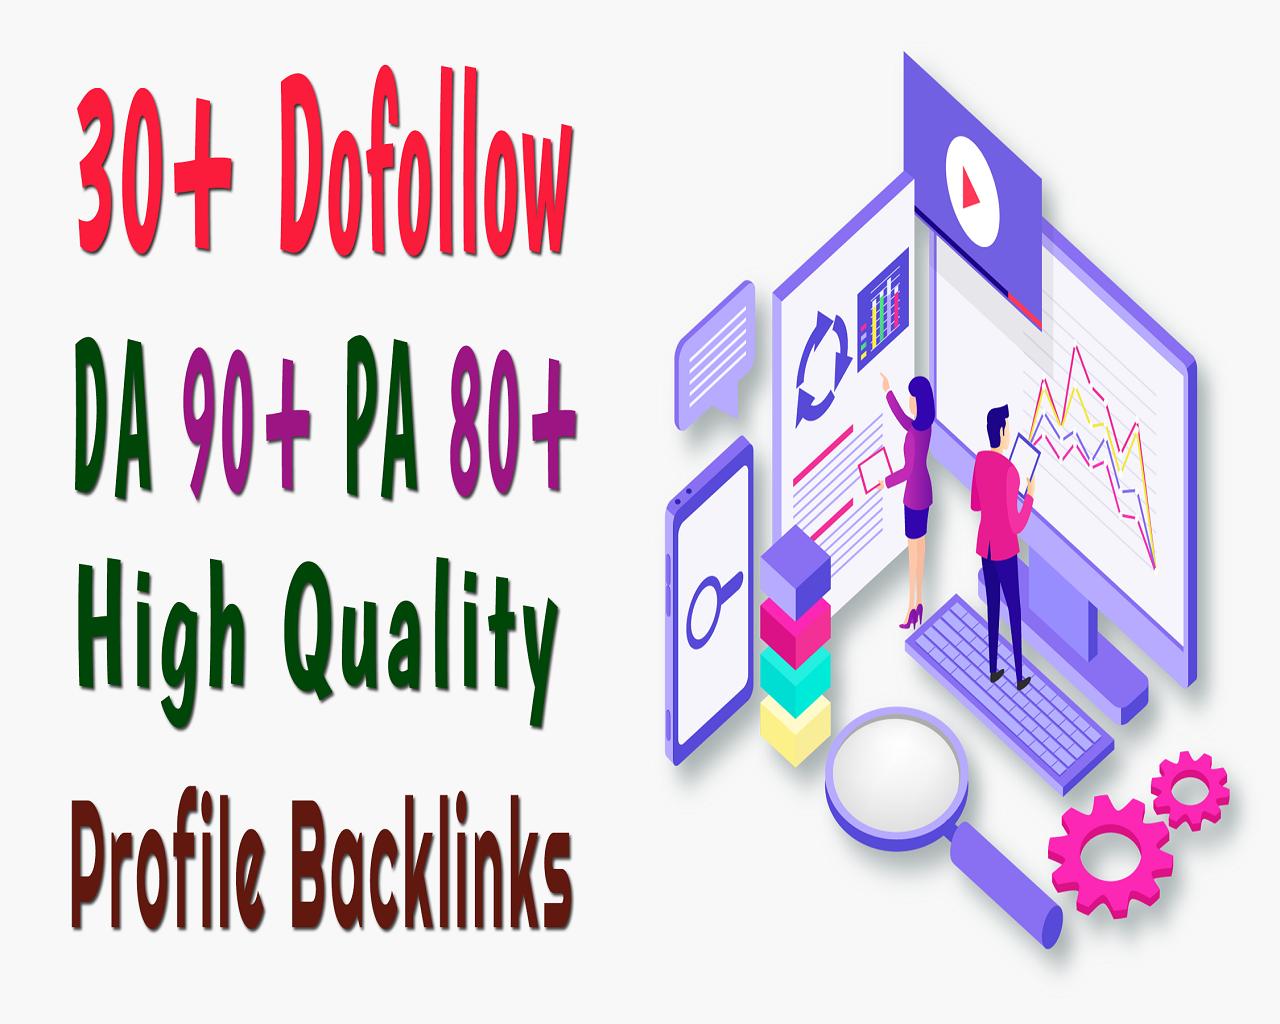 Manually Do 30 Dofollow High Quality Seo Pr9 Profiles Backlinks